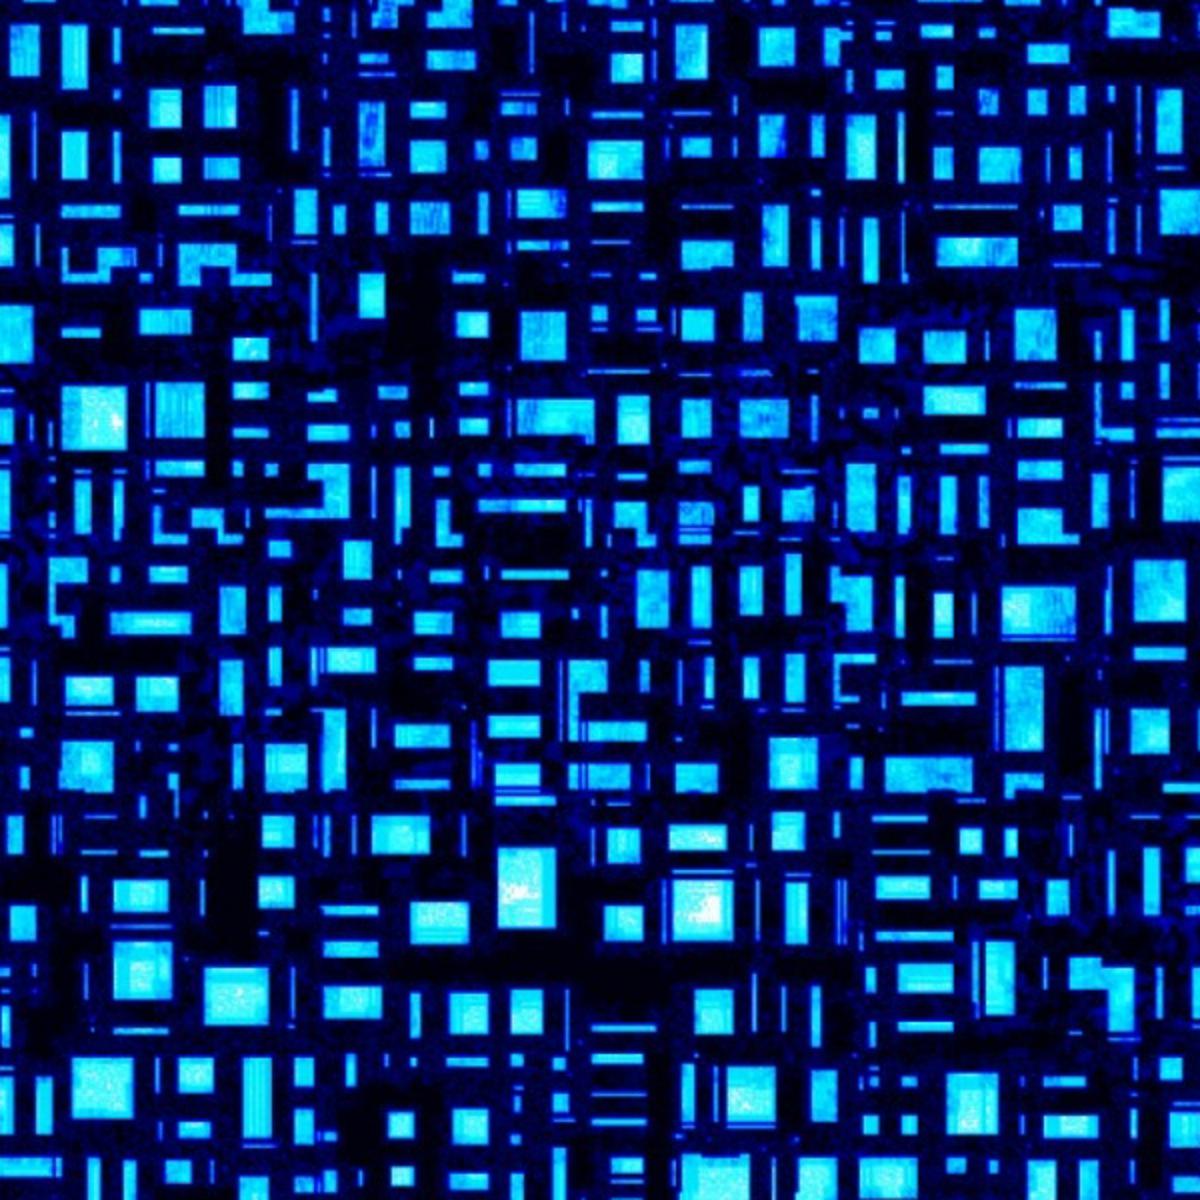 Topic Modelling Honeywell Glassdoor Reviews   Kaggle